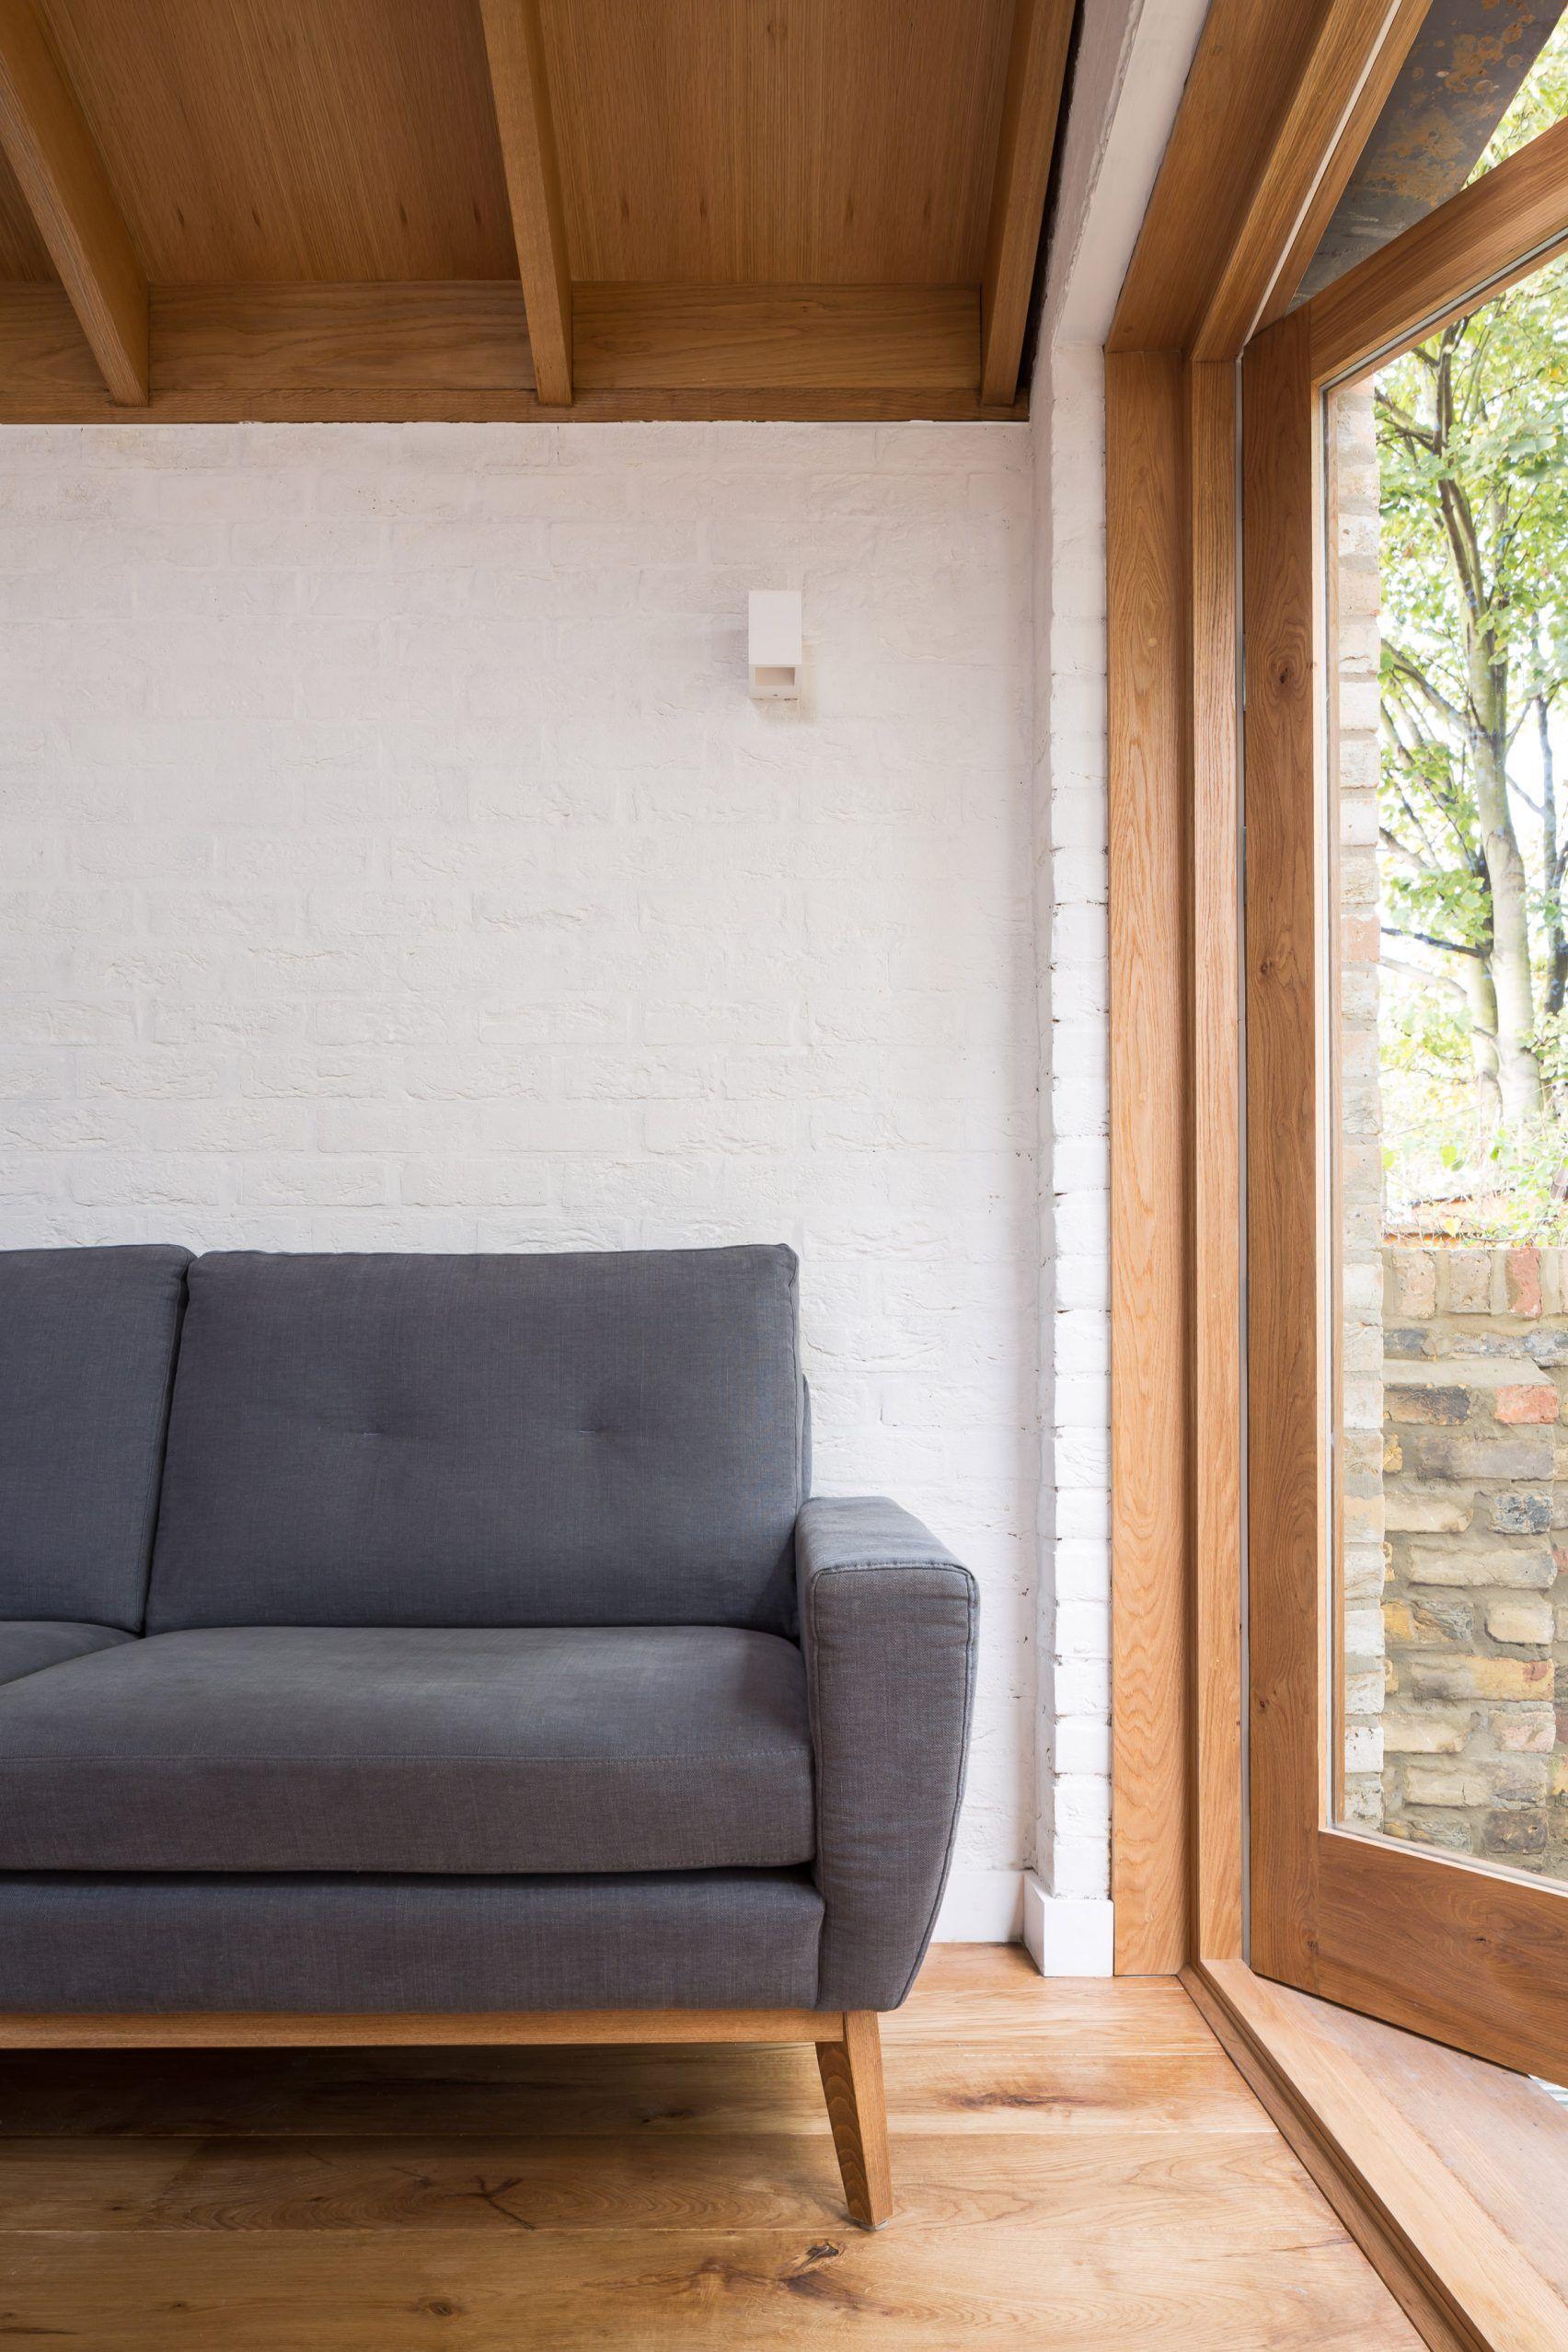 Photography adam scott sweet home make interior decoration design ideas also pink girl sculpture for unique ts and decor rh pinterest